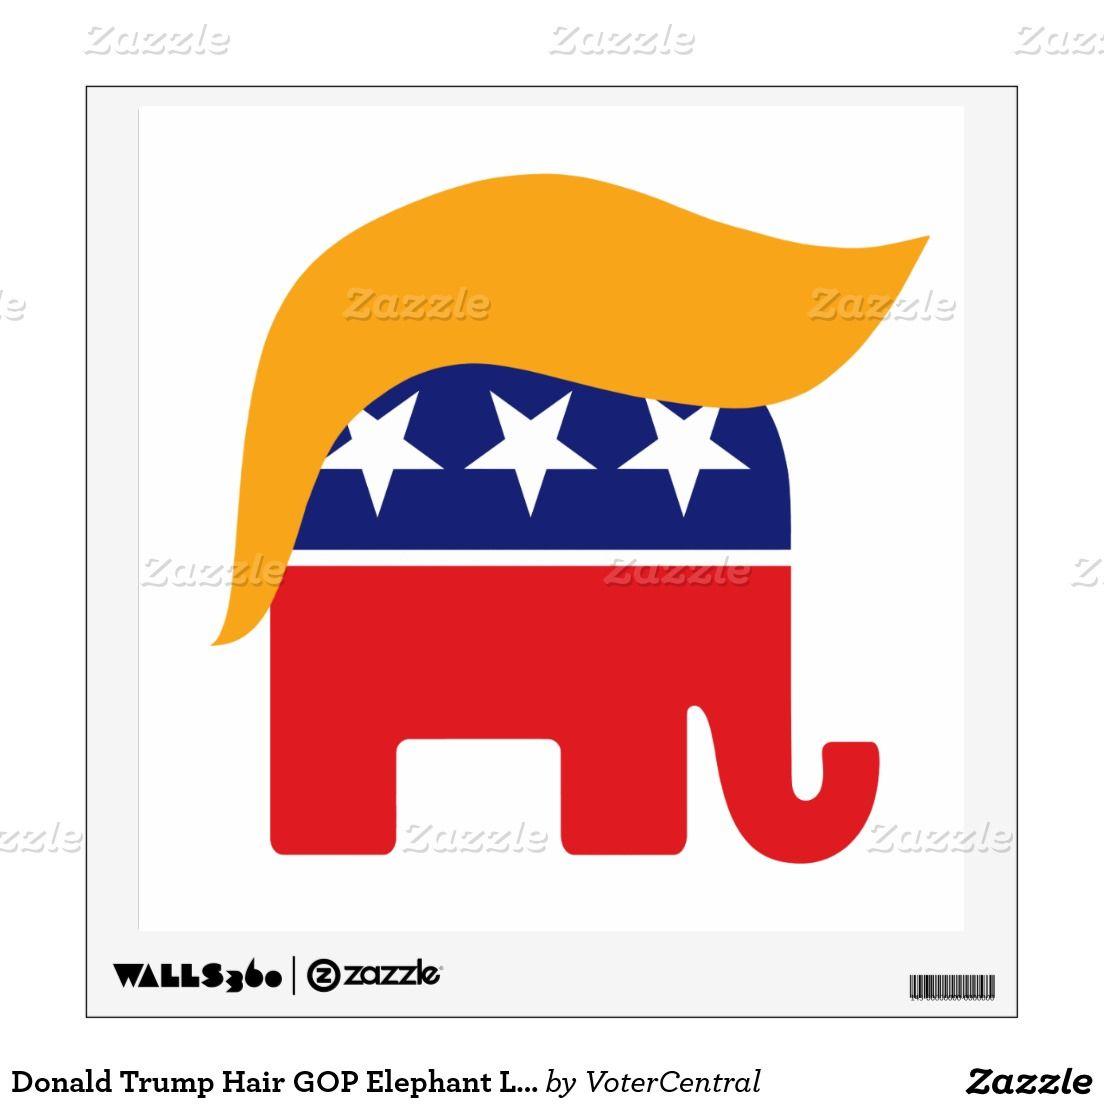 Donald Trump Hair GOP Elephant Logo Wall Decal.